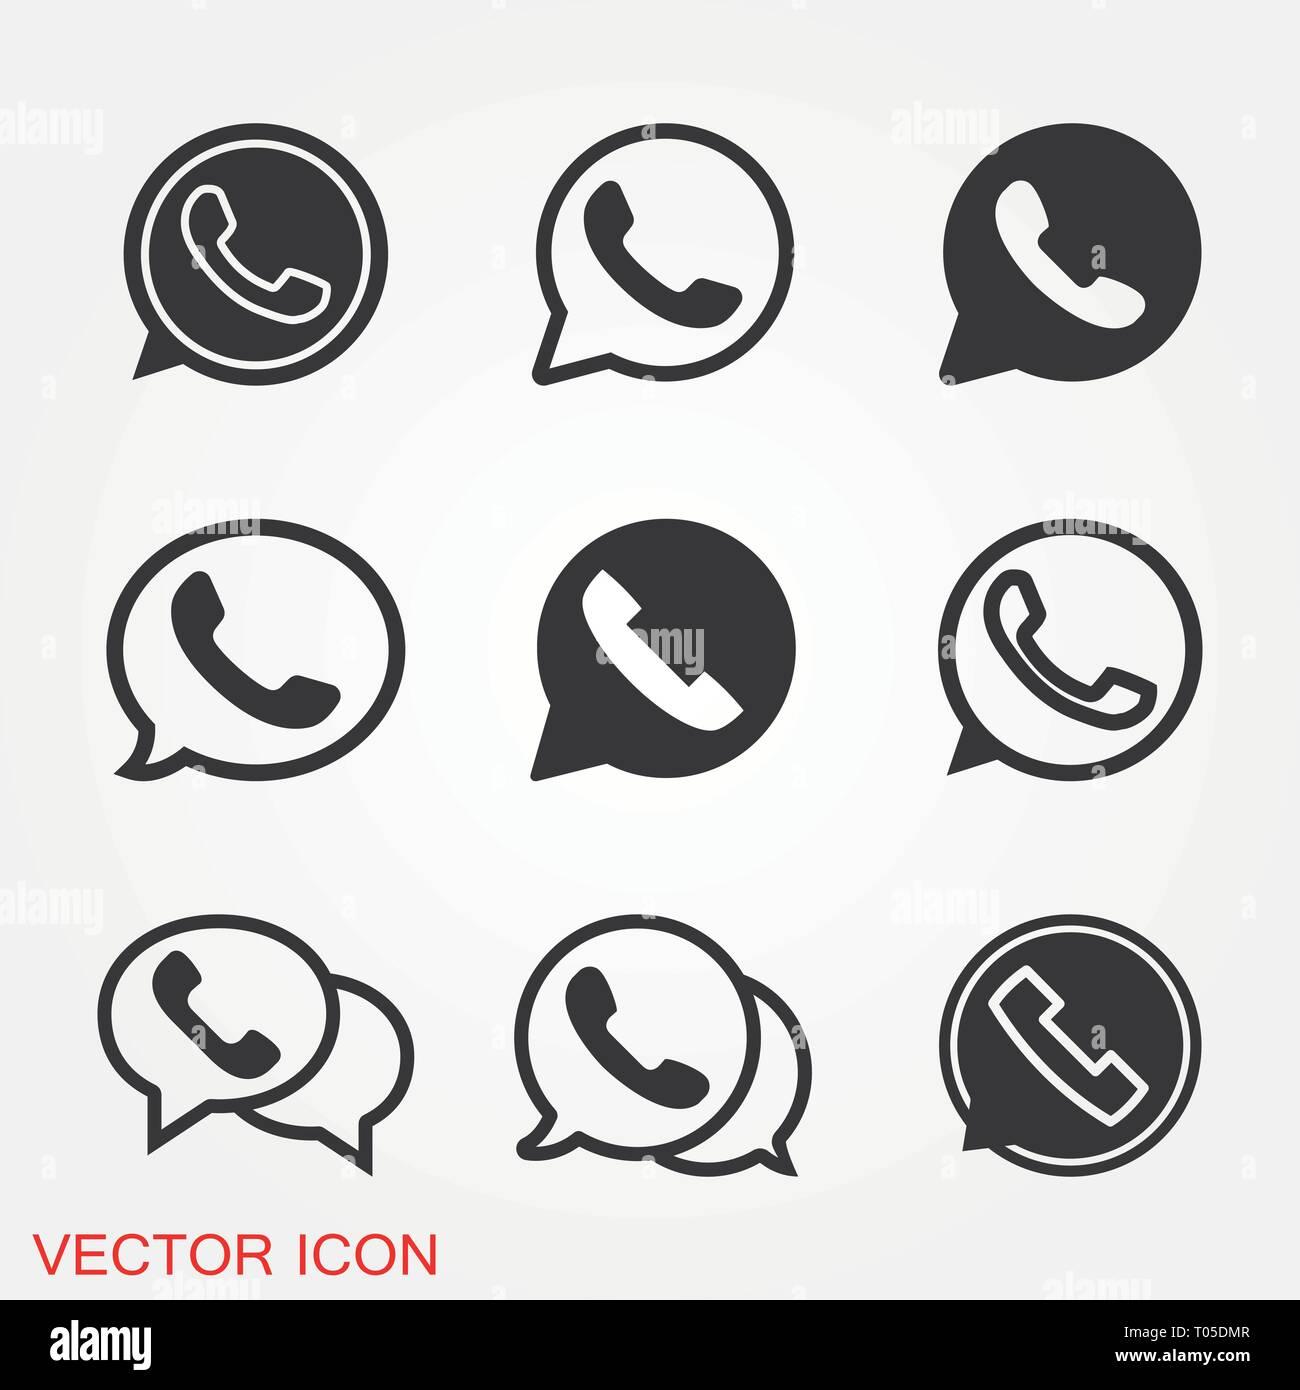 Telephone Icon Whatsapp Icon Vector Sign Symbol For Design Stock Vector Image Art Alamy